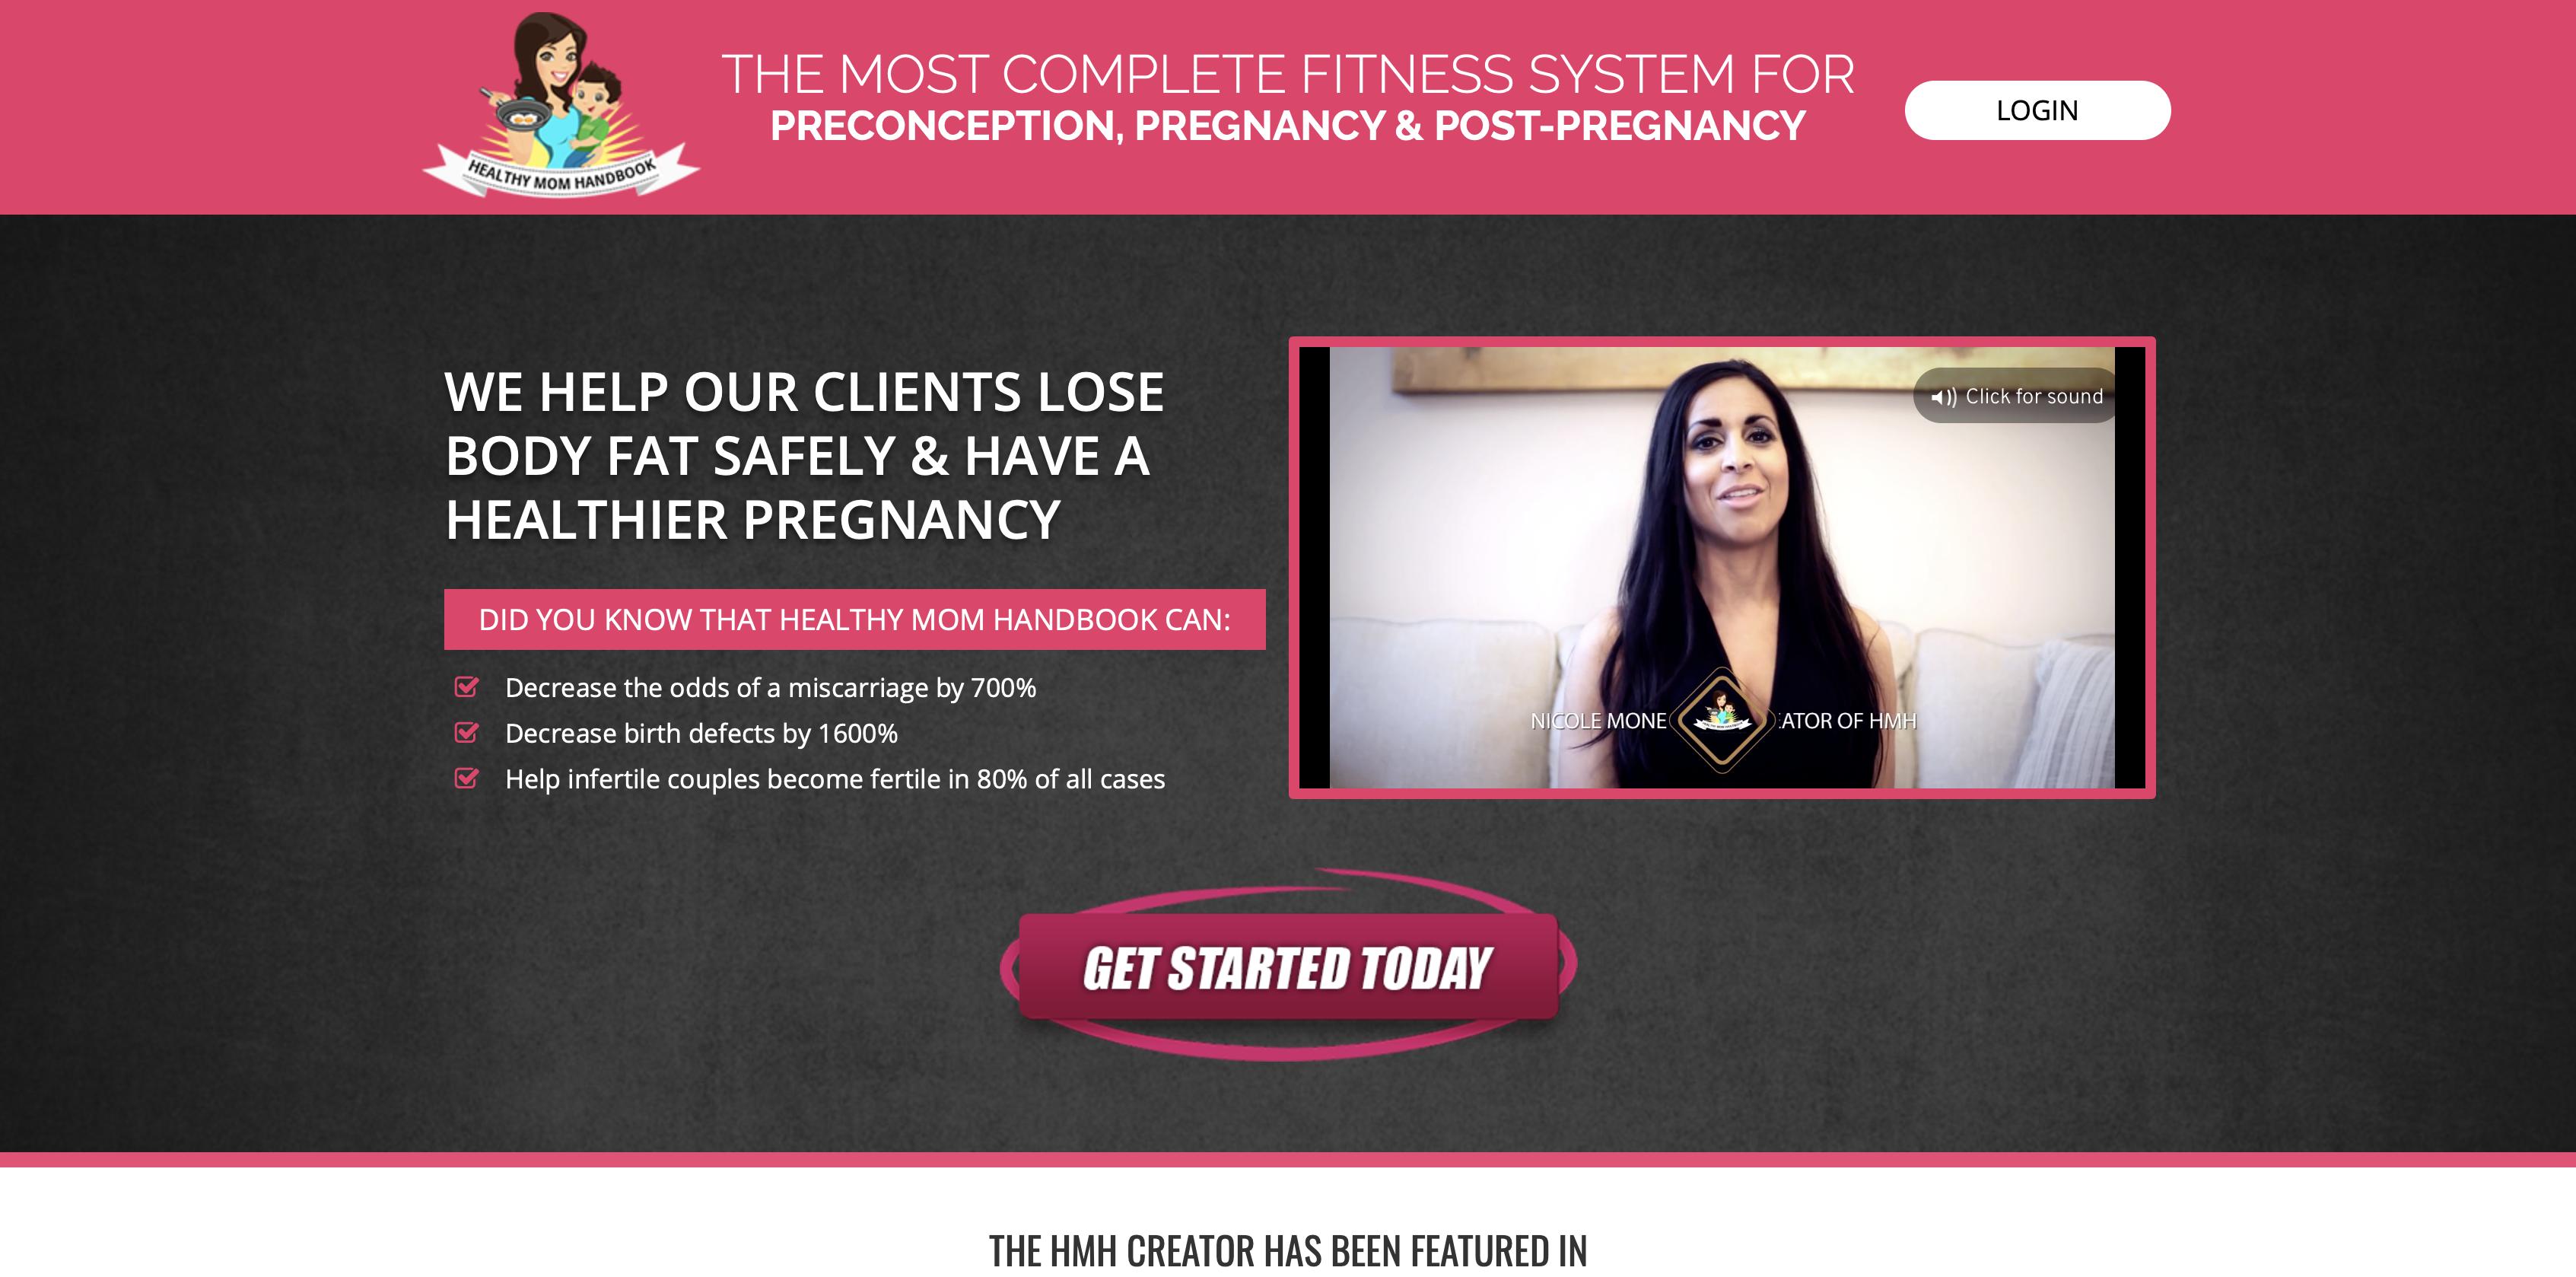 HealthyMomHandbook.com